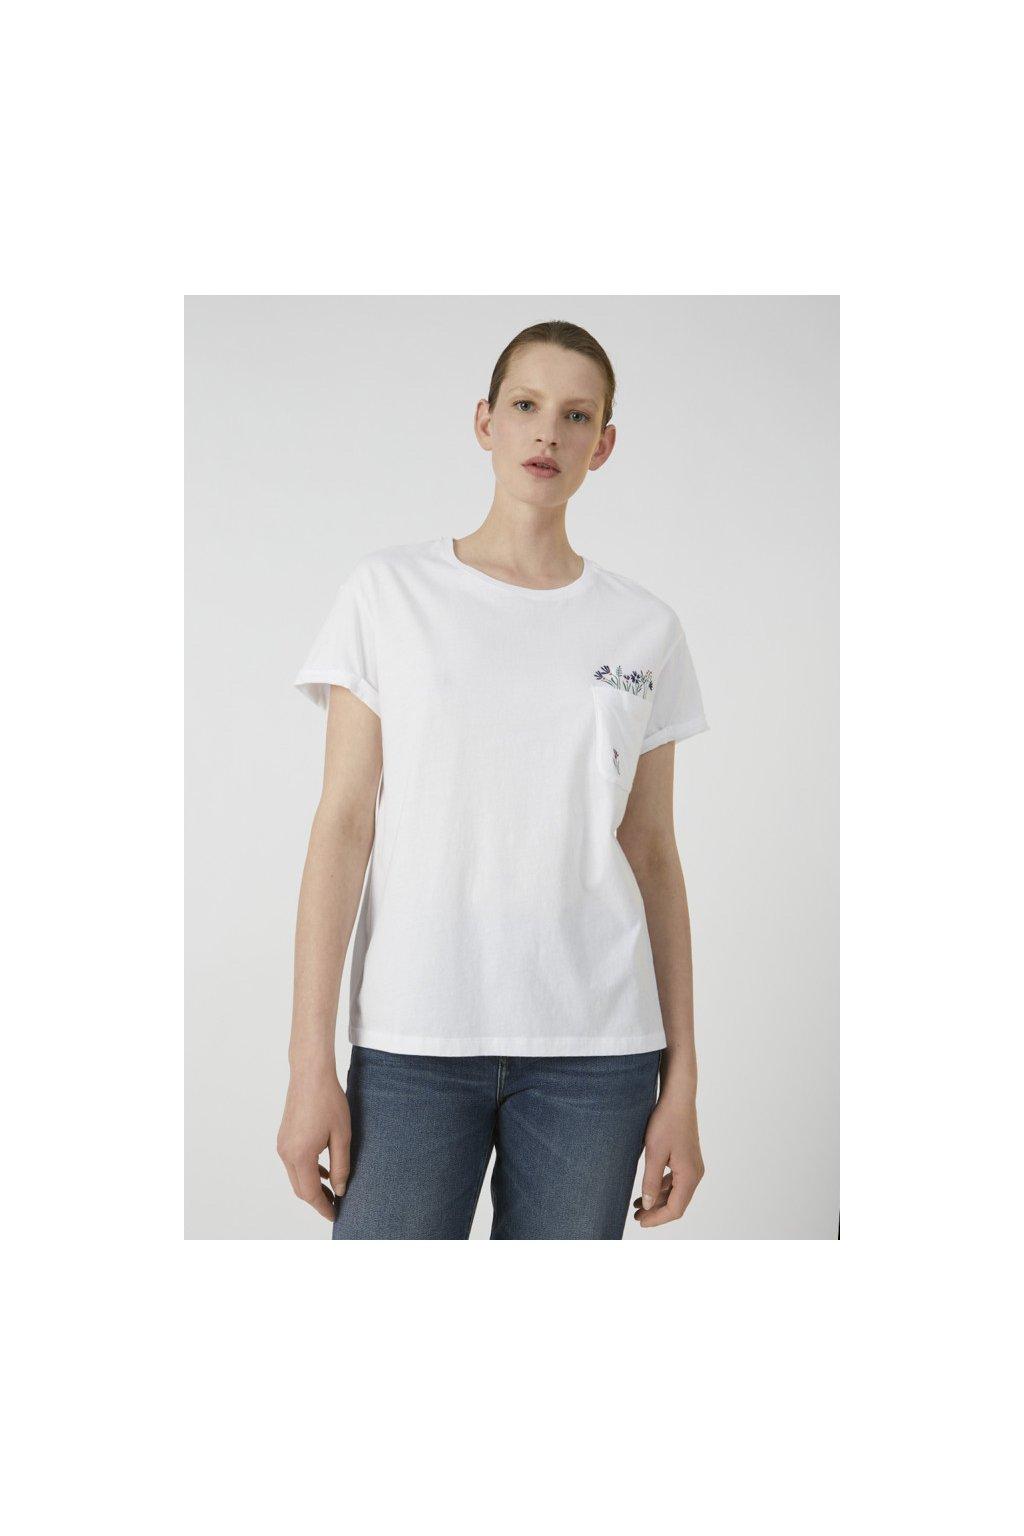 "Dámské bílé tričko z biobavlny ""NAALIN POCKET FULL OF FLOWERS"" (Velikost L)"